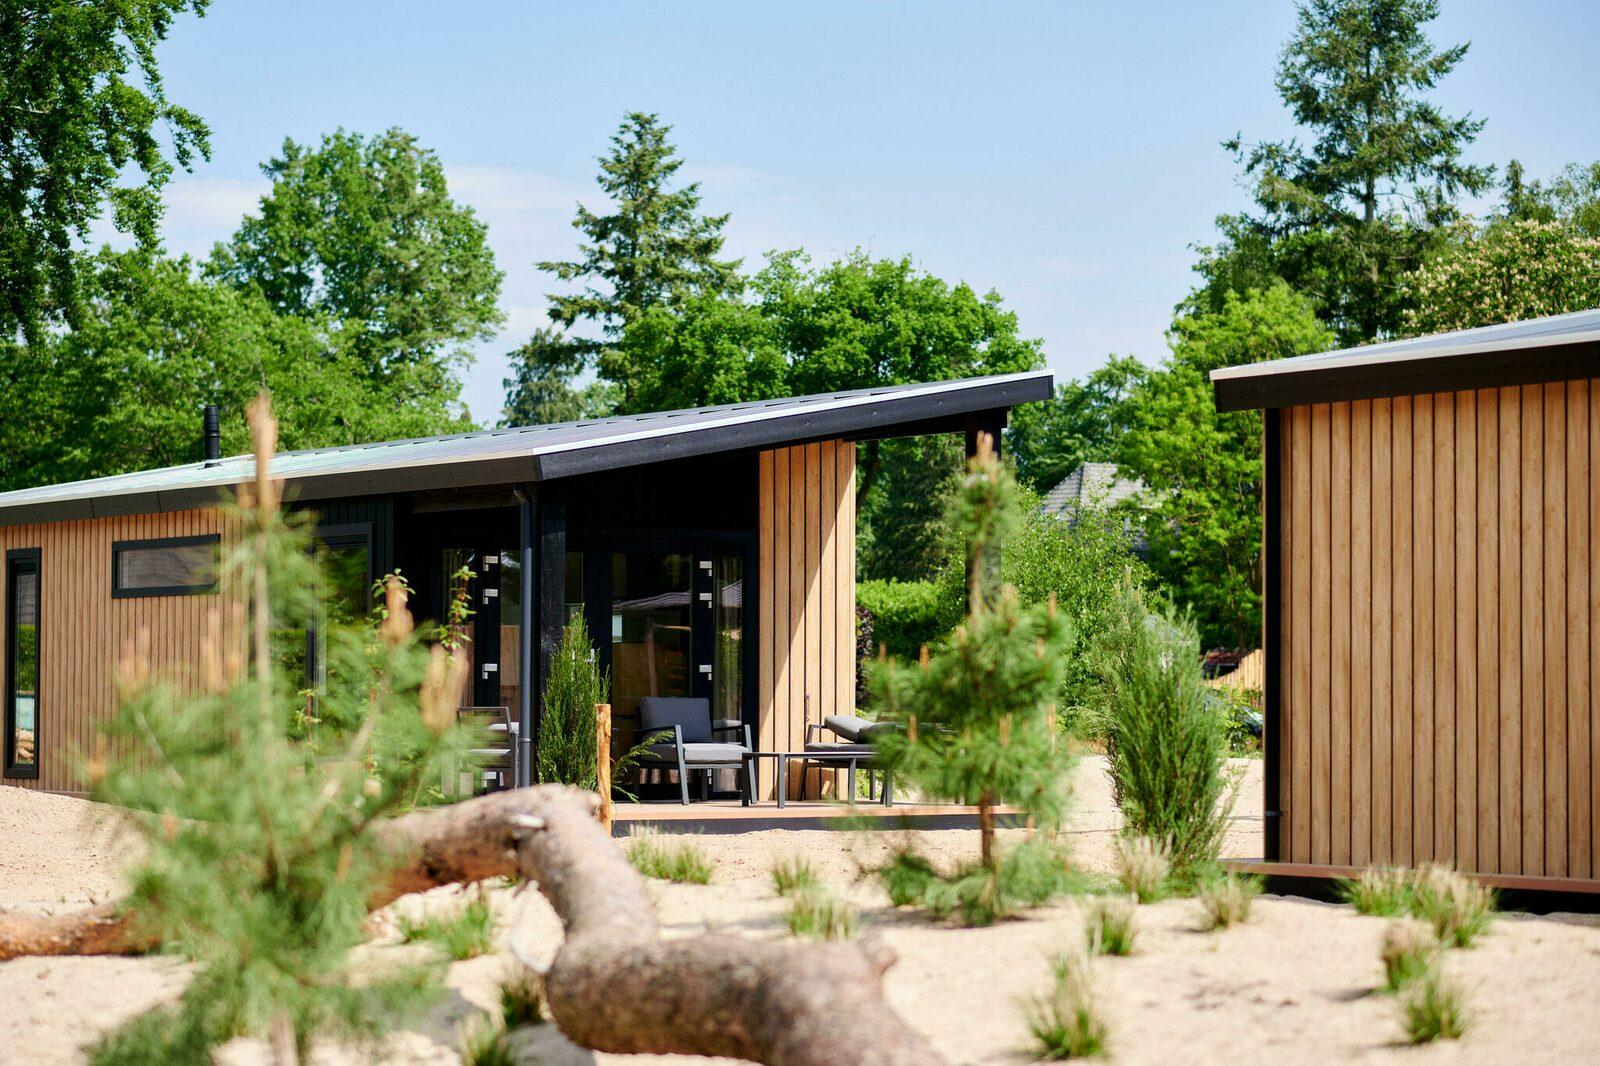 Sand Lodge | 4 Ppl.